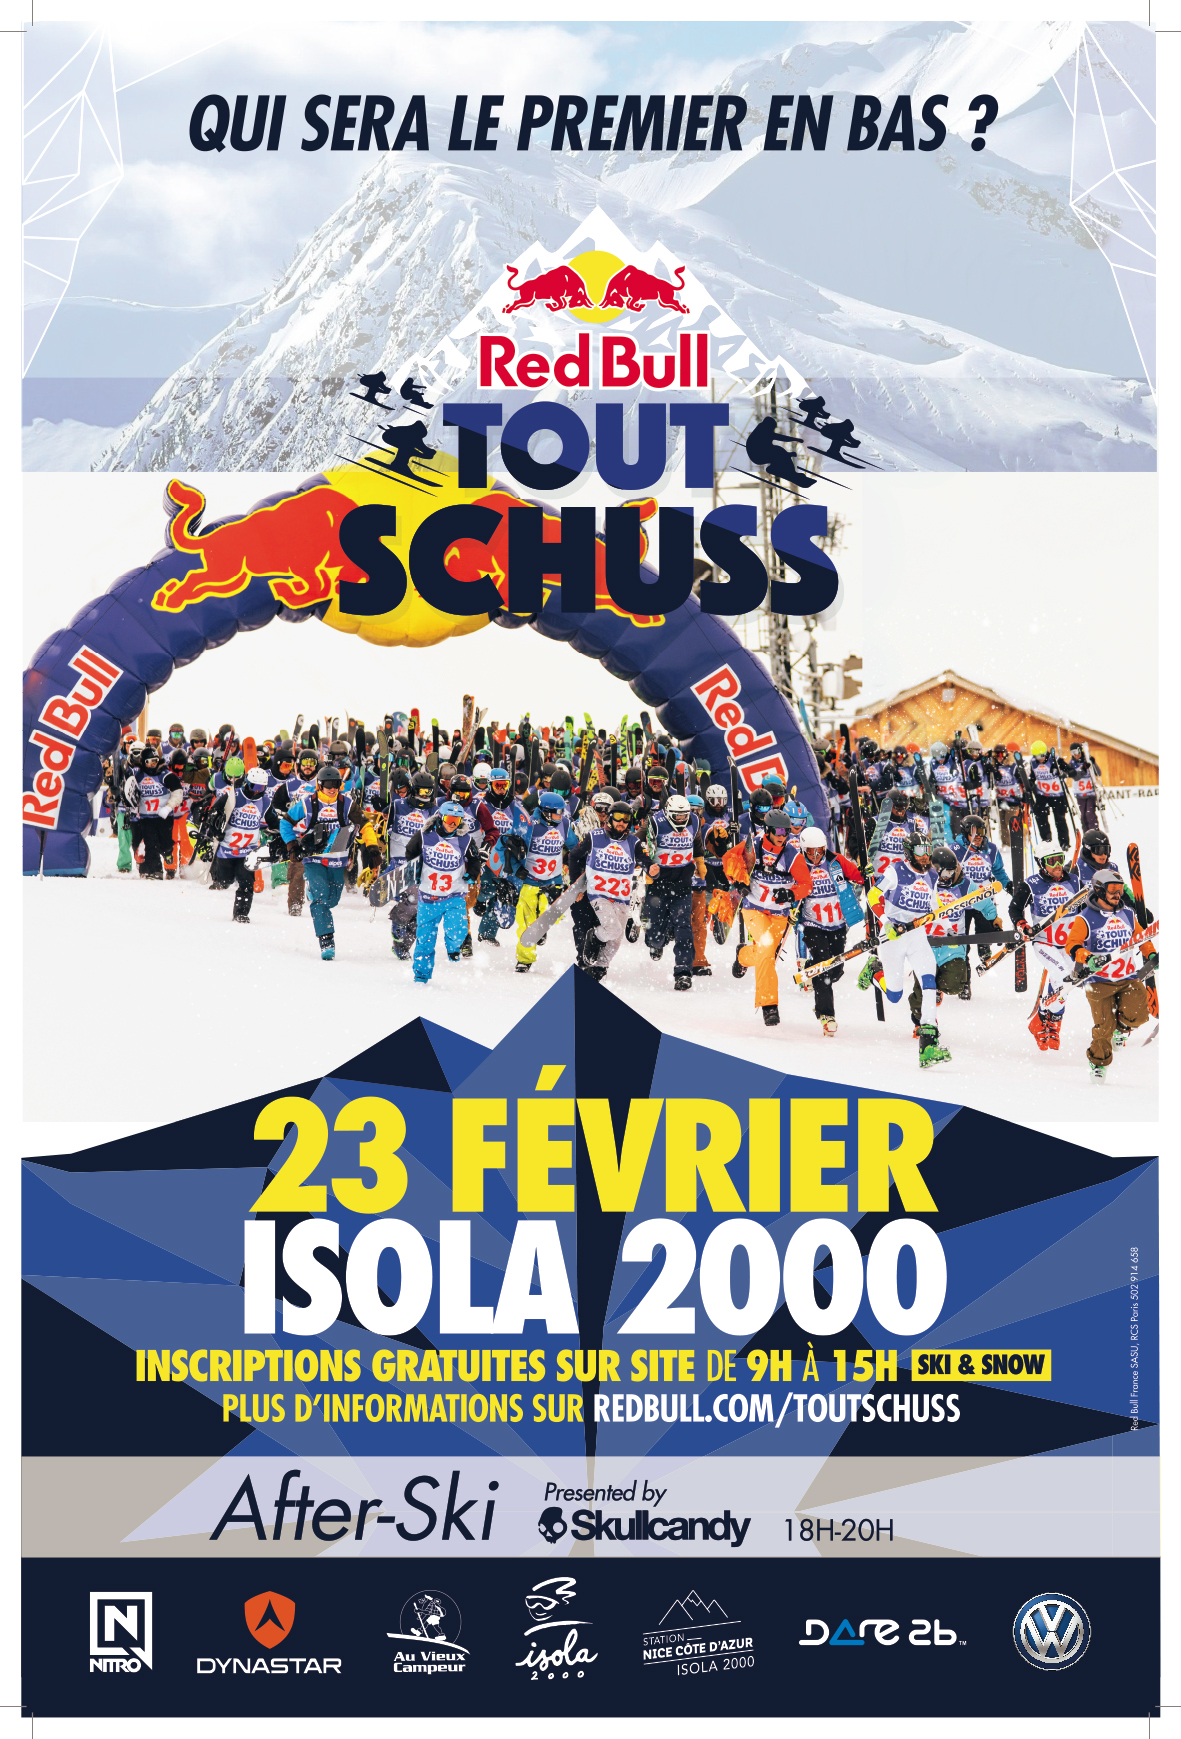 Red Bull - Tout Schuss sur Isola 2000